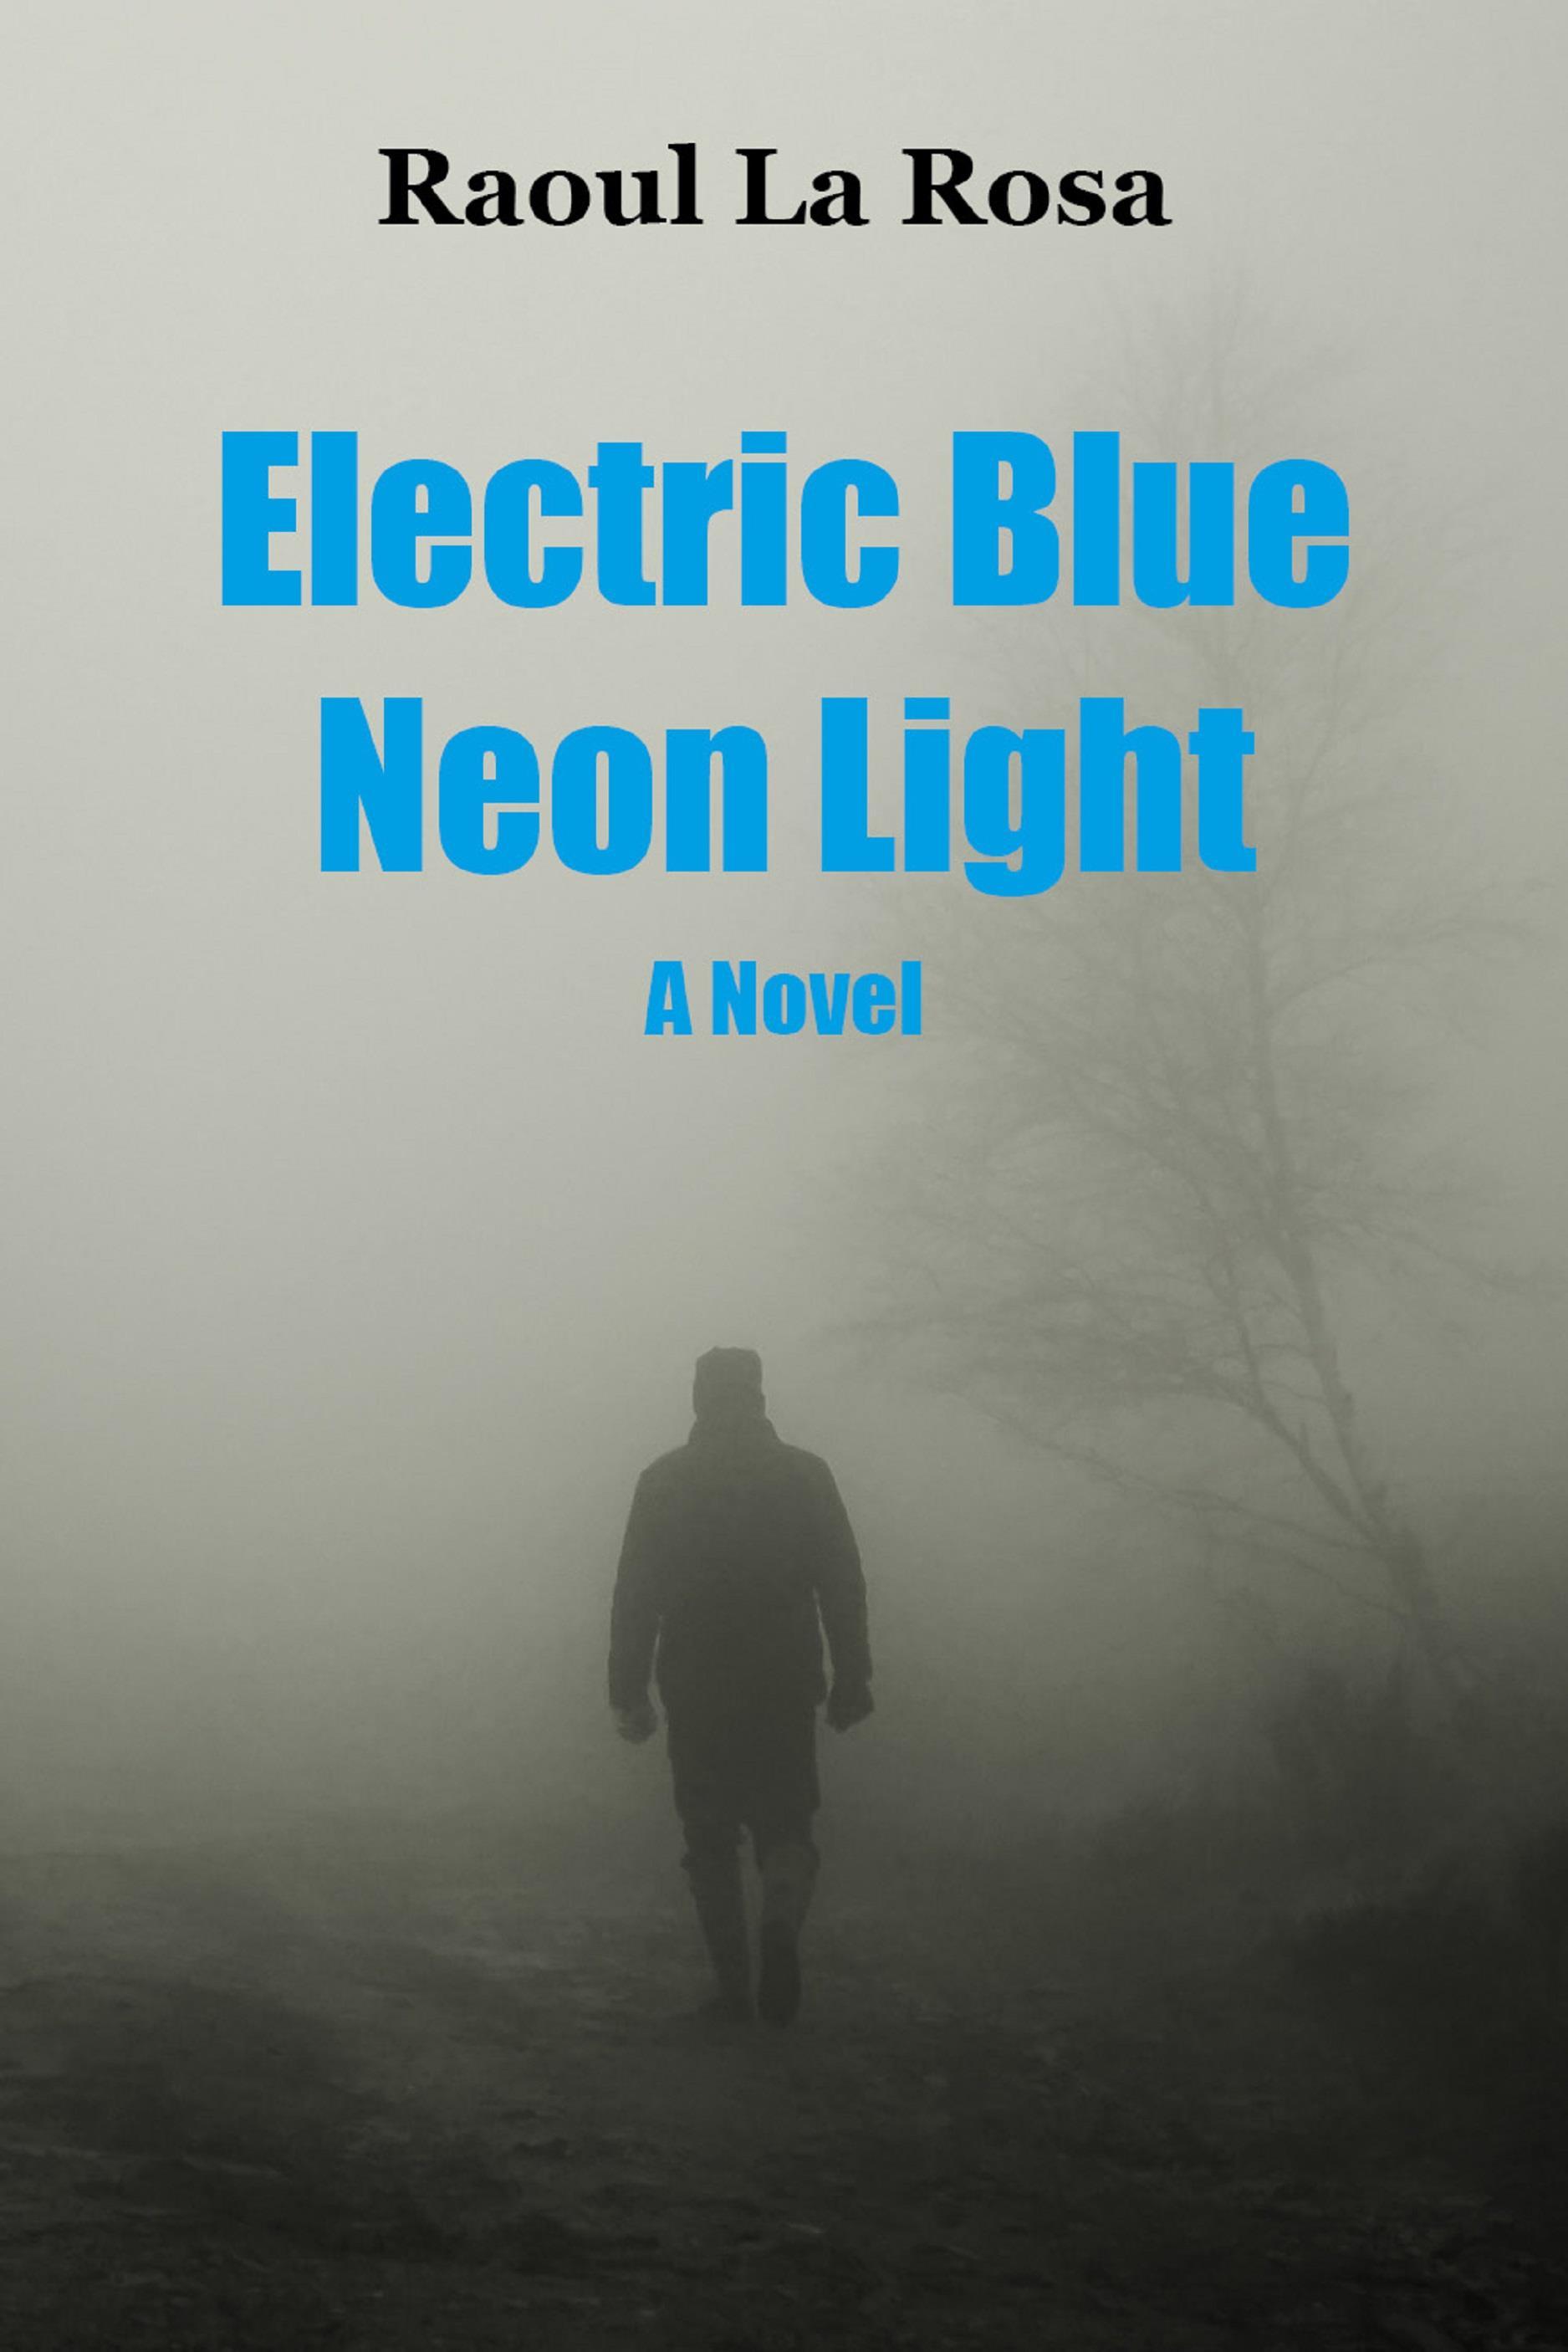 Electric Blue Neon Light